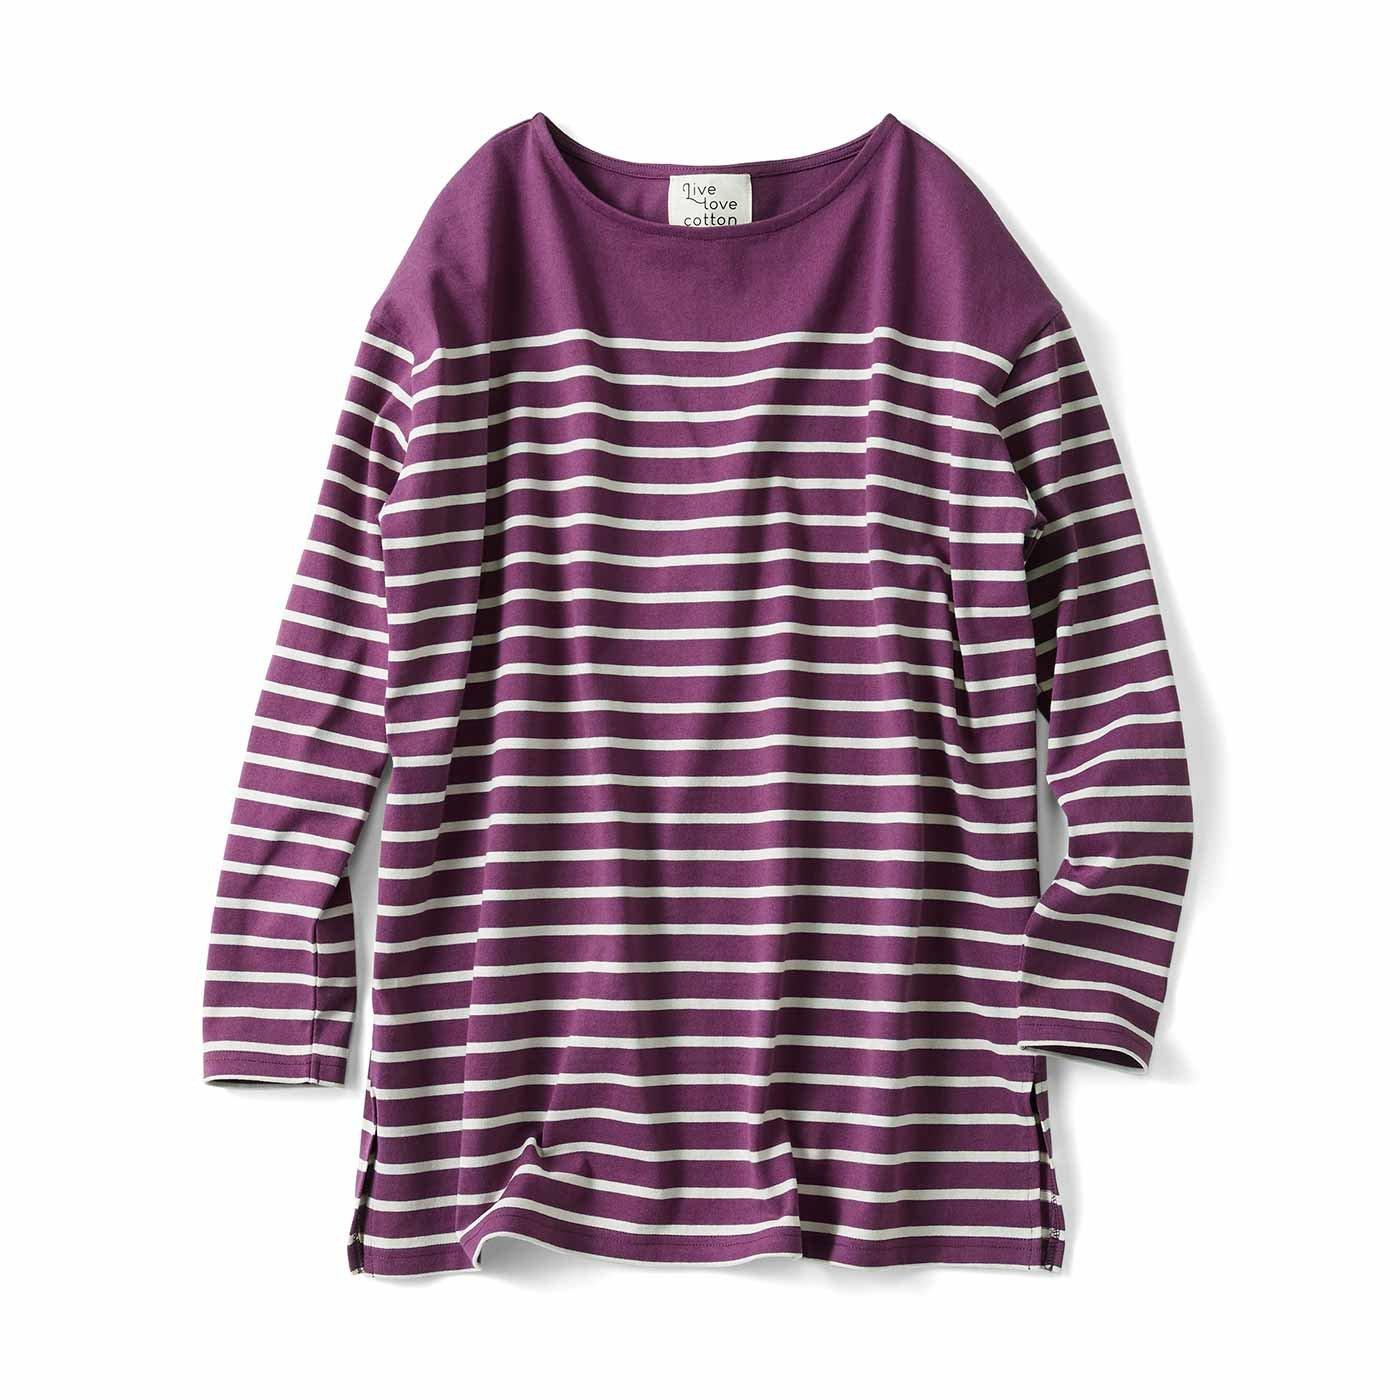 Live love cottonプロジェクト リブ イン コンフォート ラフに着るだけできまる! 空紡糸で軽やかなオーガニックコットンボーダートップス〈パープル〉